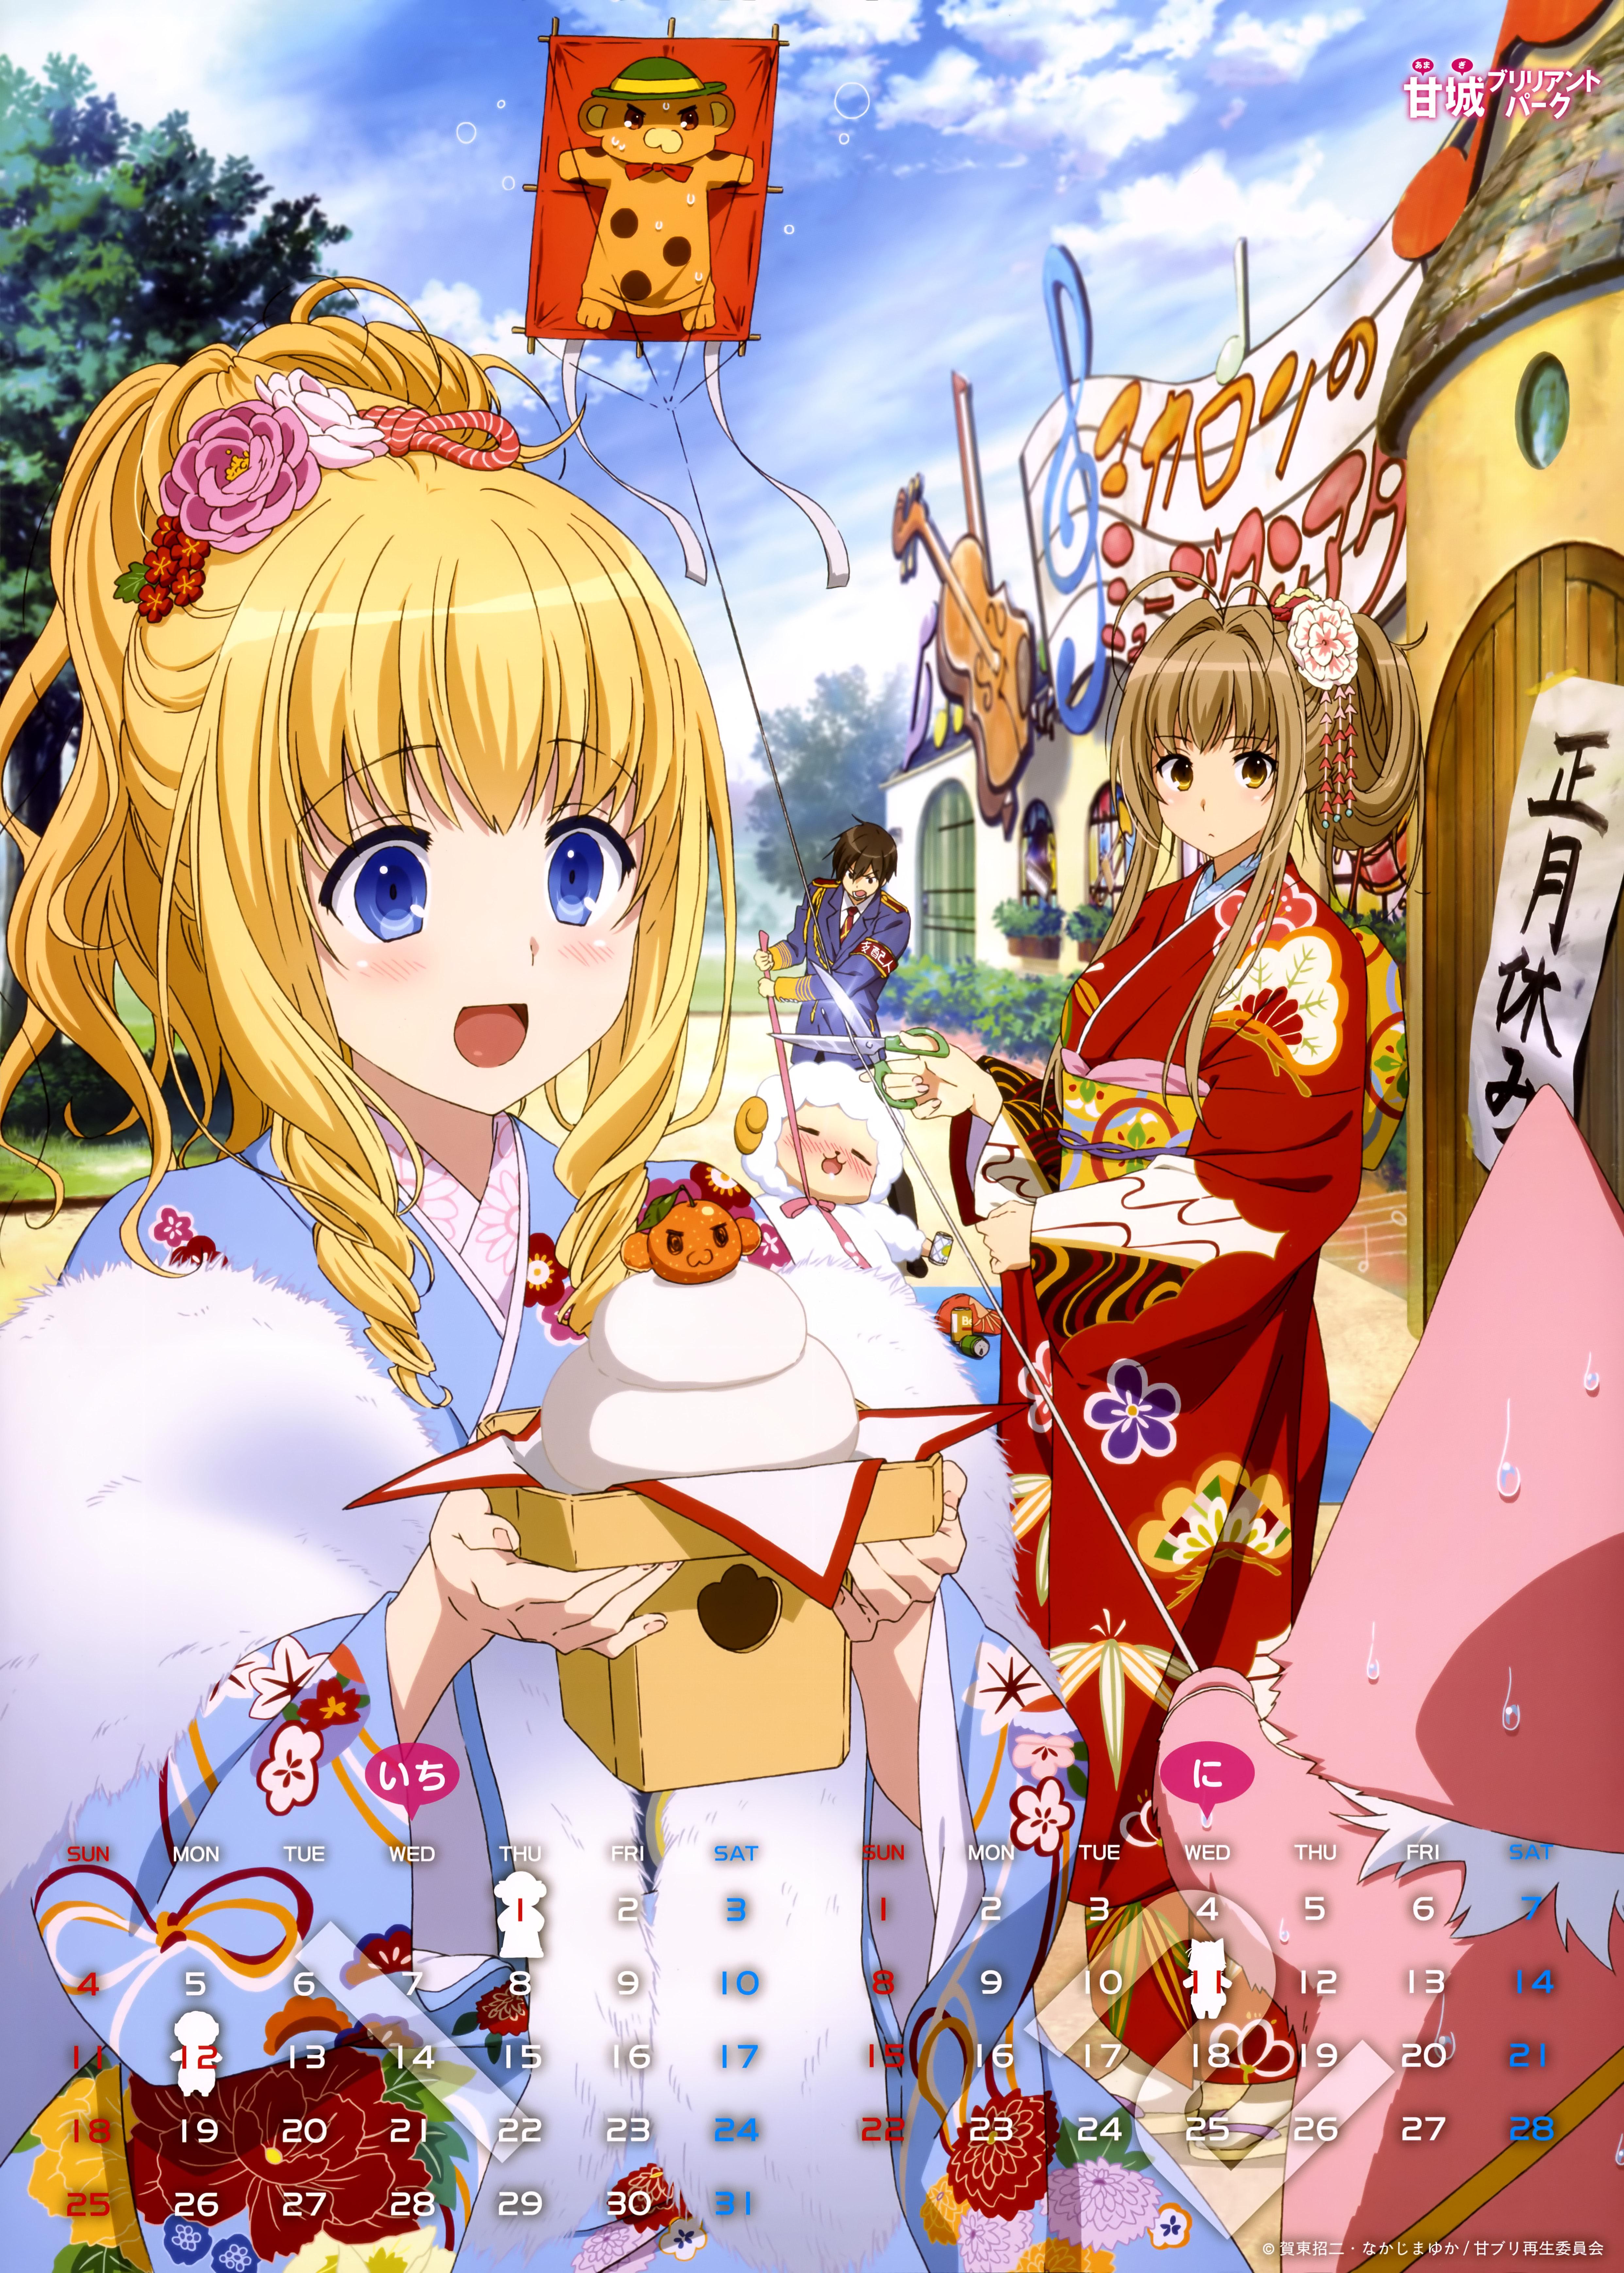 Amagi Brilliant Park 2015 Calendar Previewed Haruhichan.com amaburi anime calendar 01